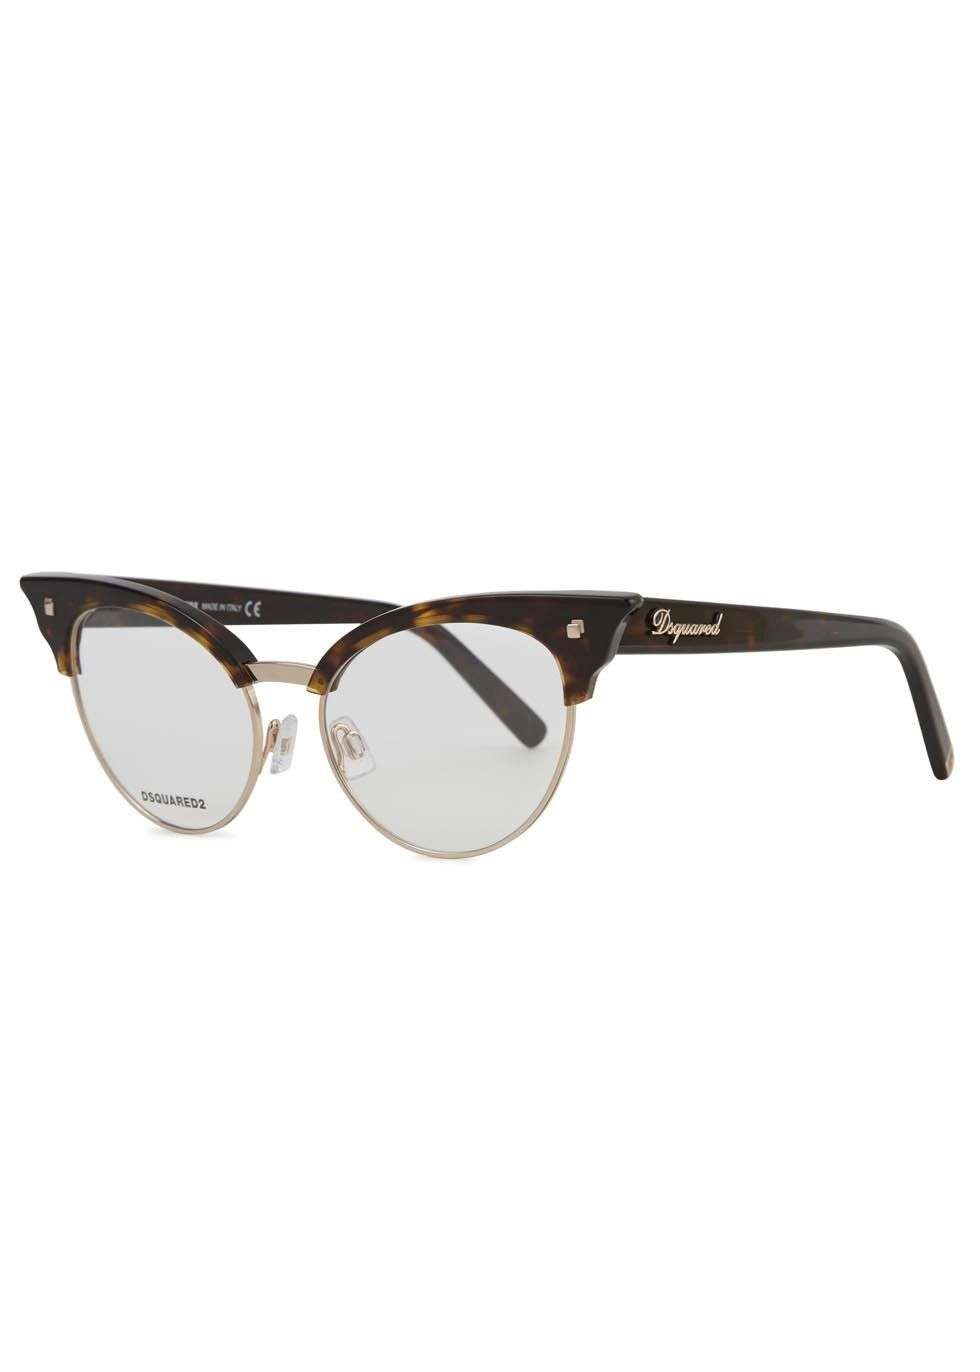 37aac9381c2 Exclusive to Harvey Nichols Dsquared  tortoiseshell cat eye glasses Designer  stamped lens